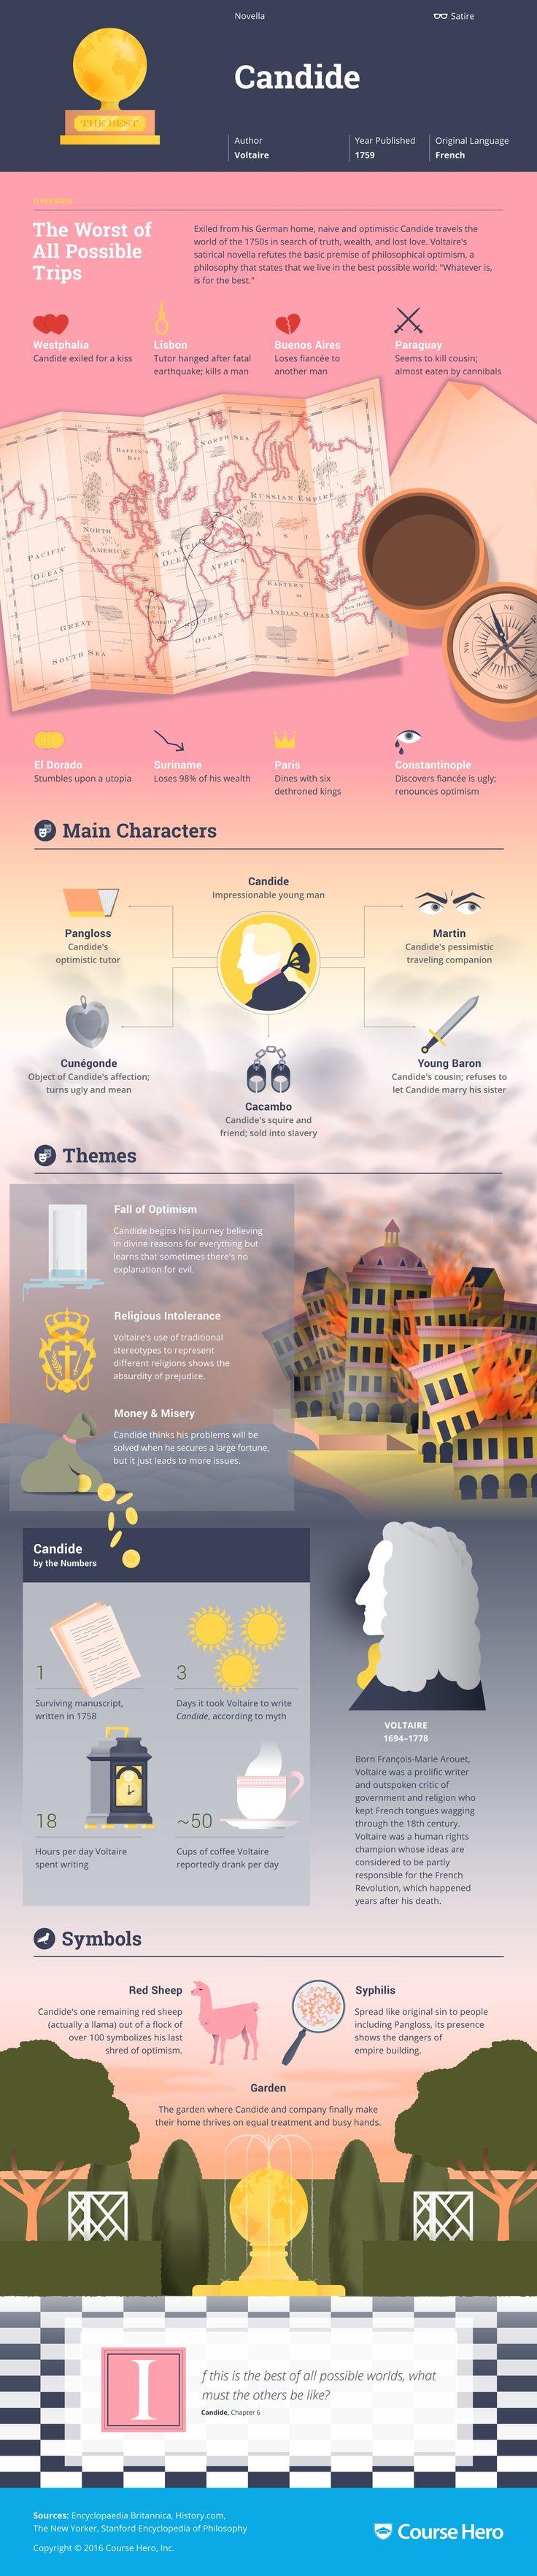 Pinterest - mutinelolita - Candide Infographic | Course Hero